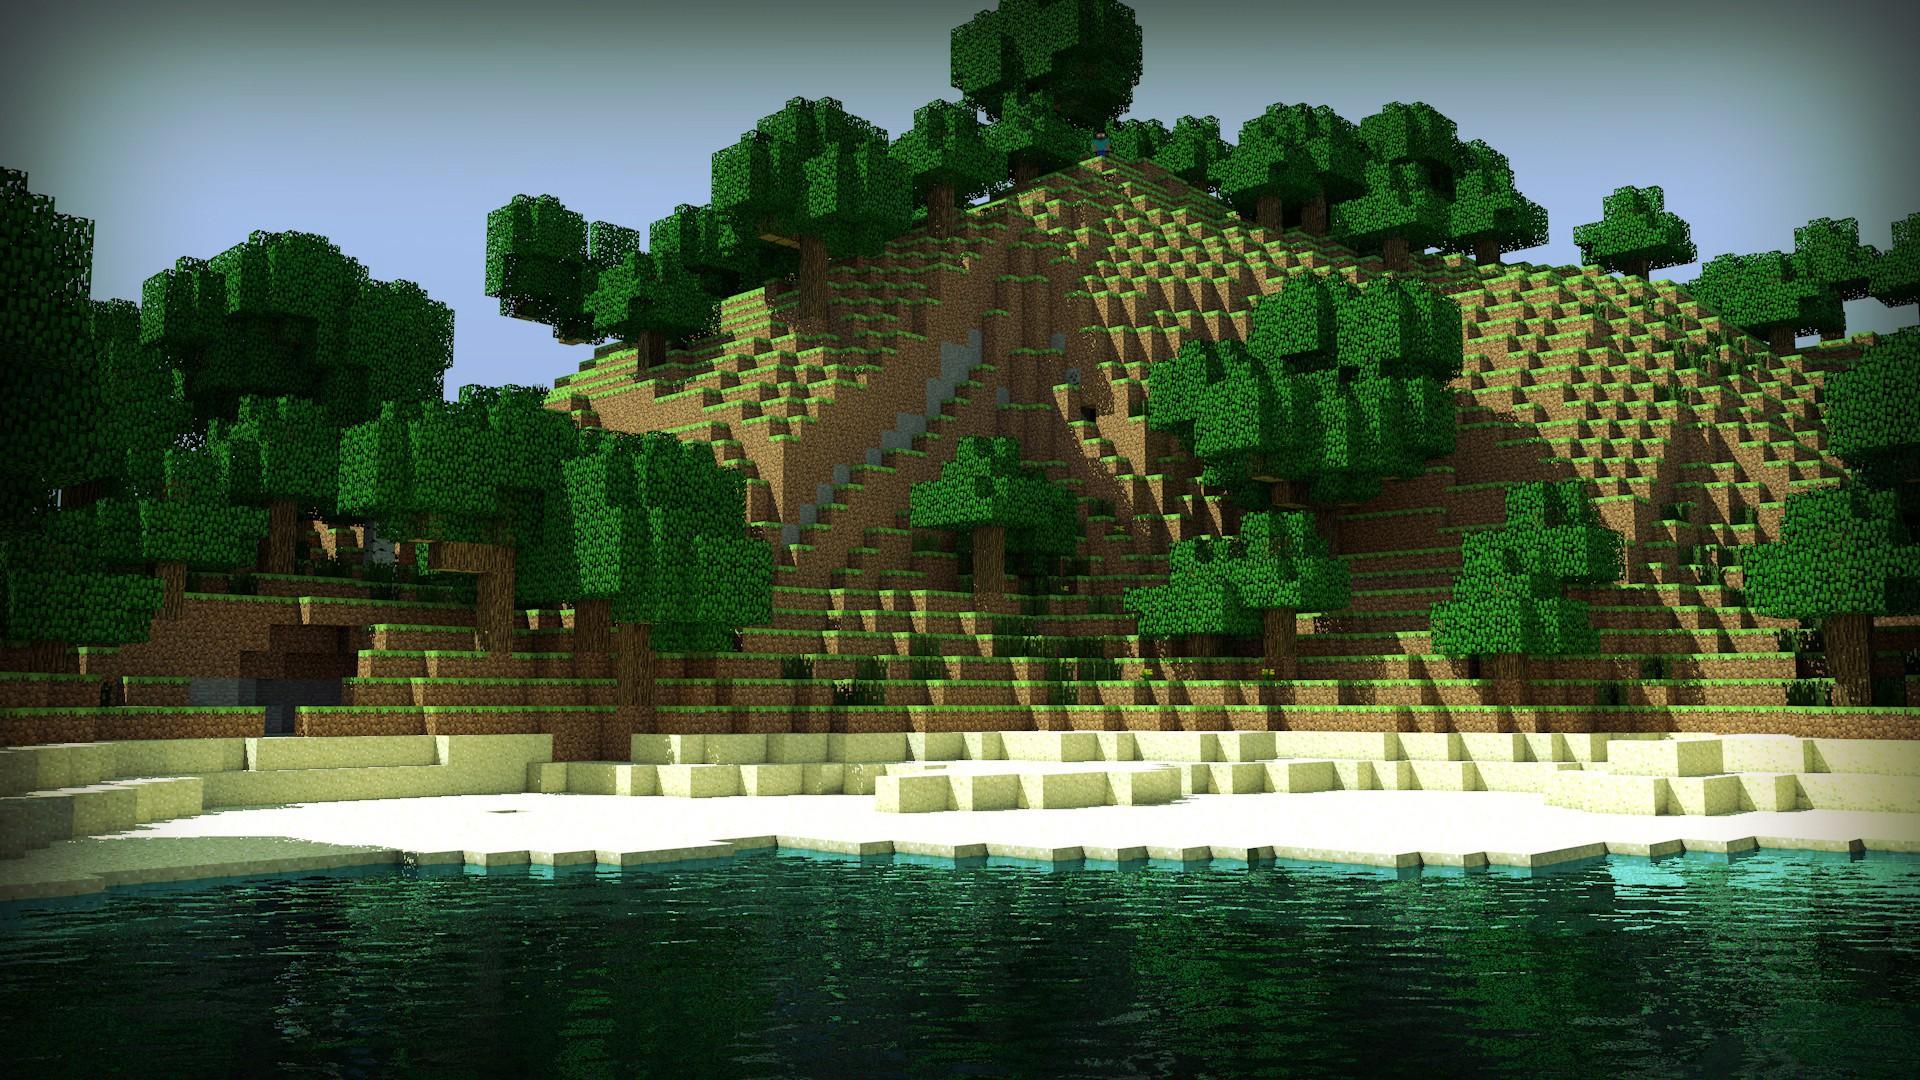 Minecraft Mountain Wallpaper 62683 1920x1080px